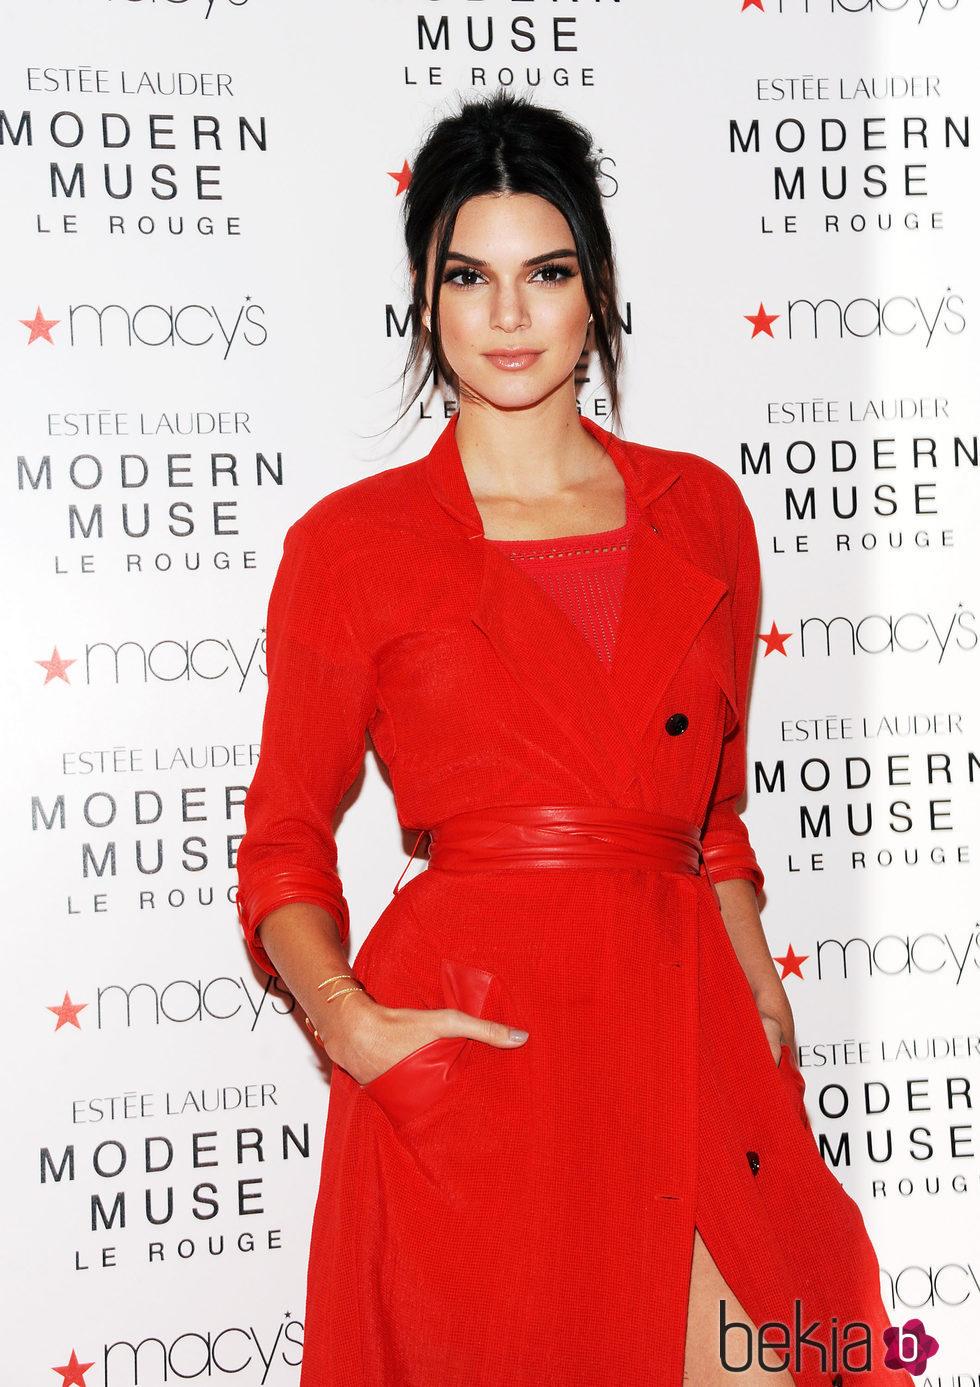 Vestido rojo de kendall jenner